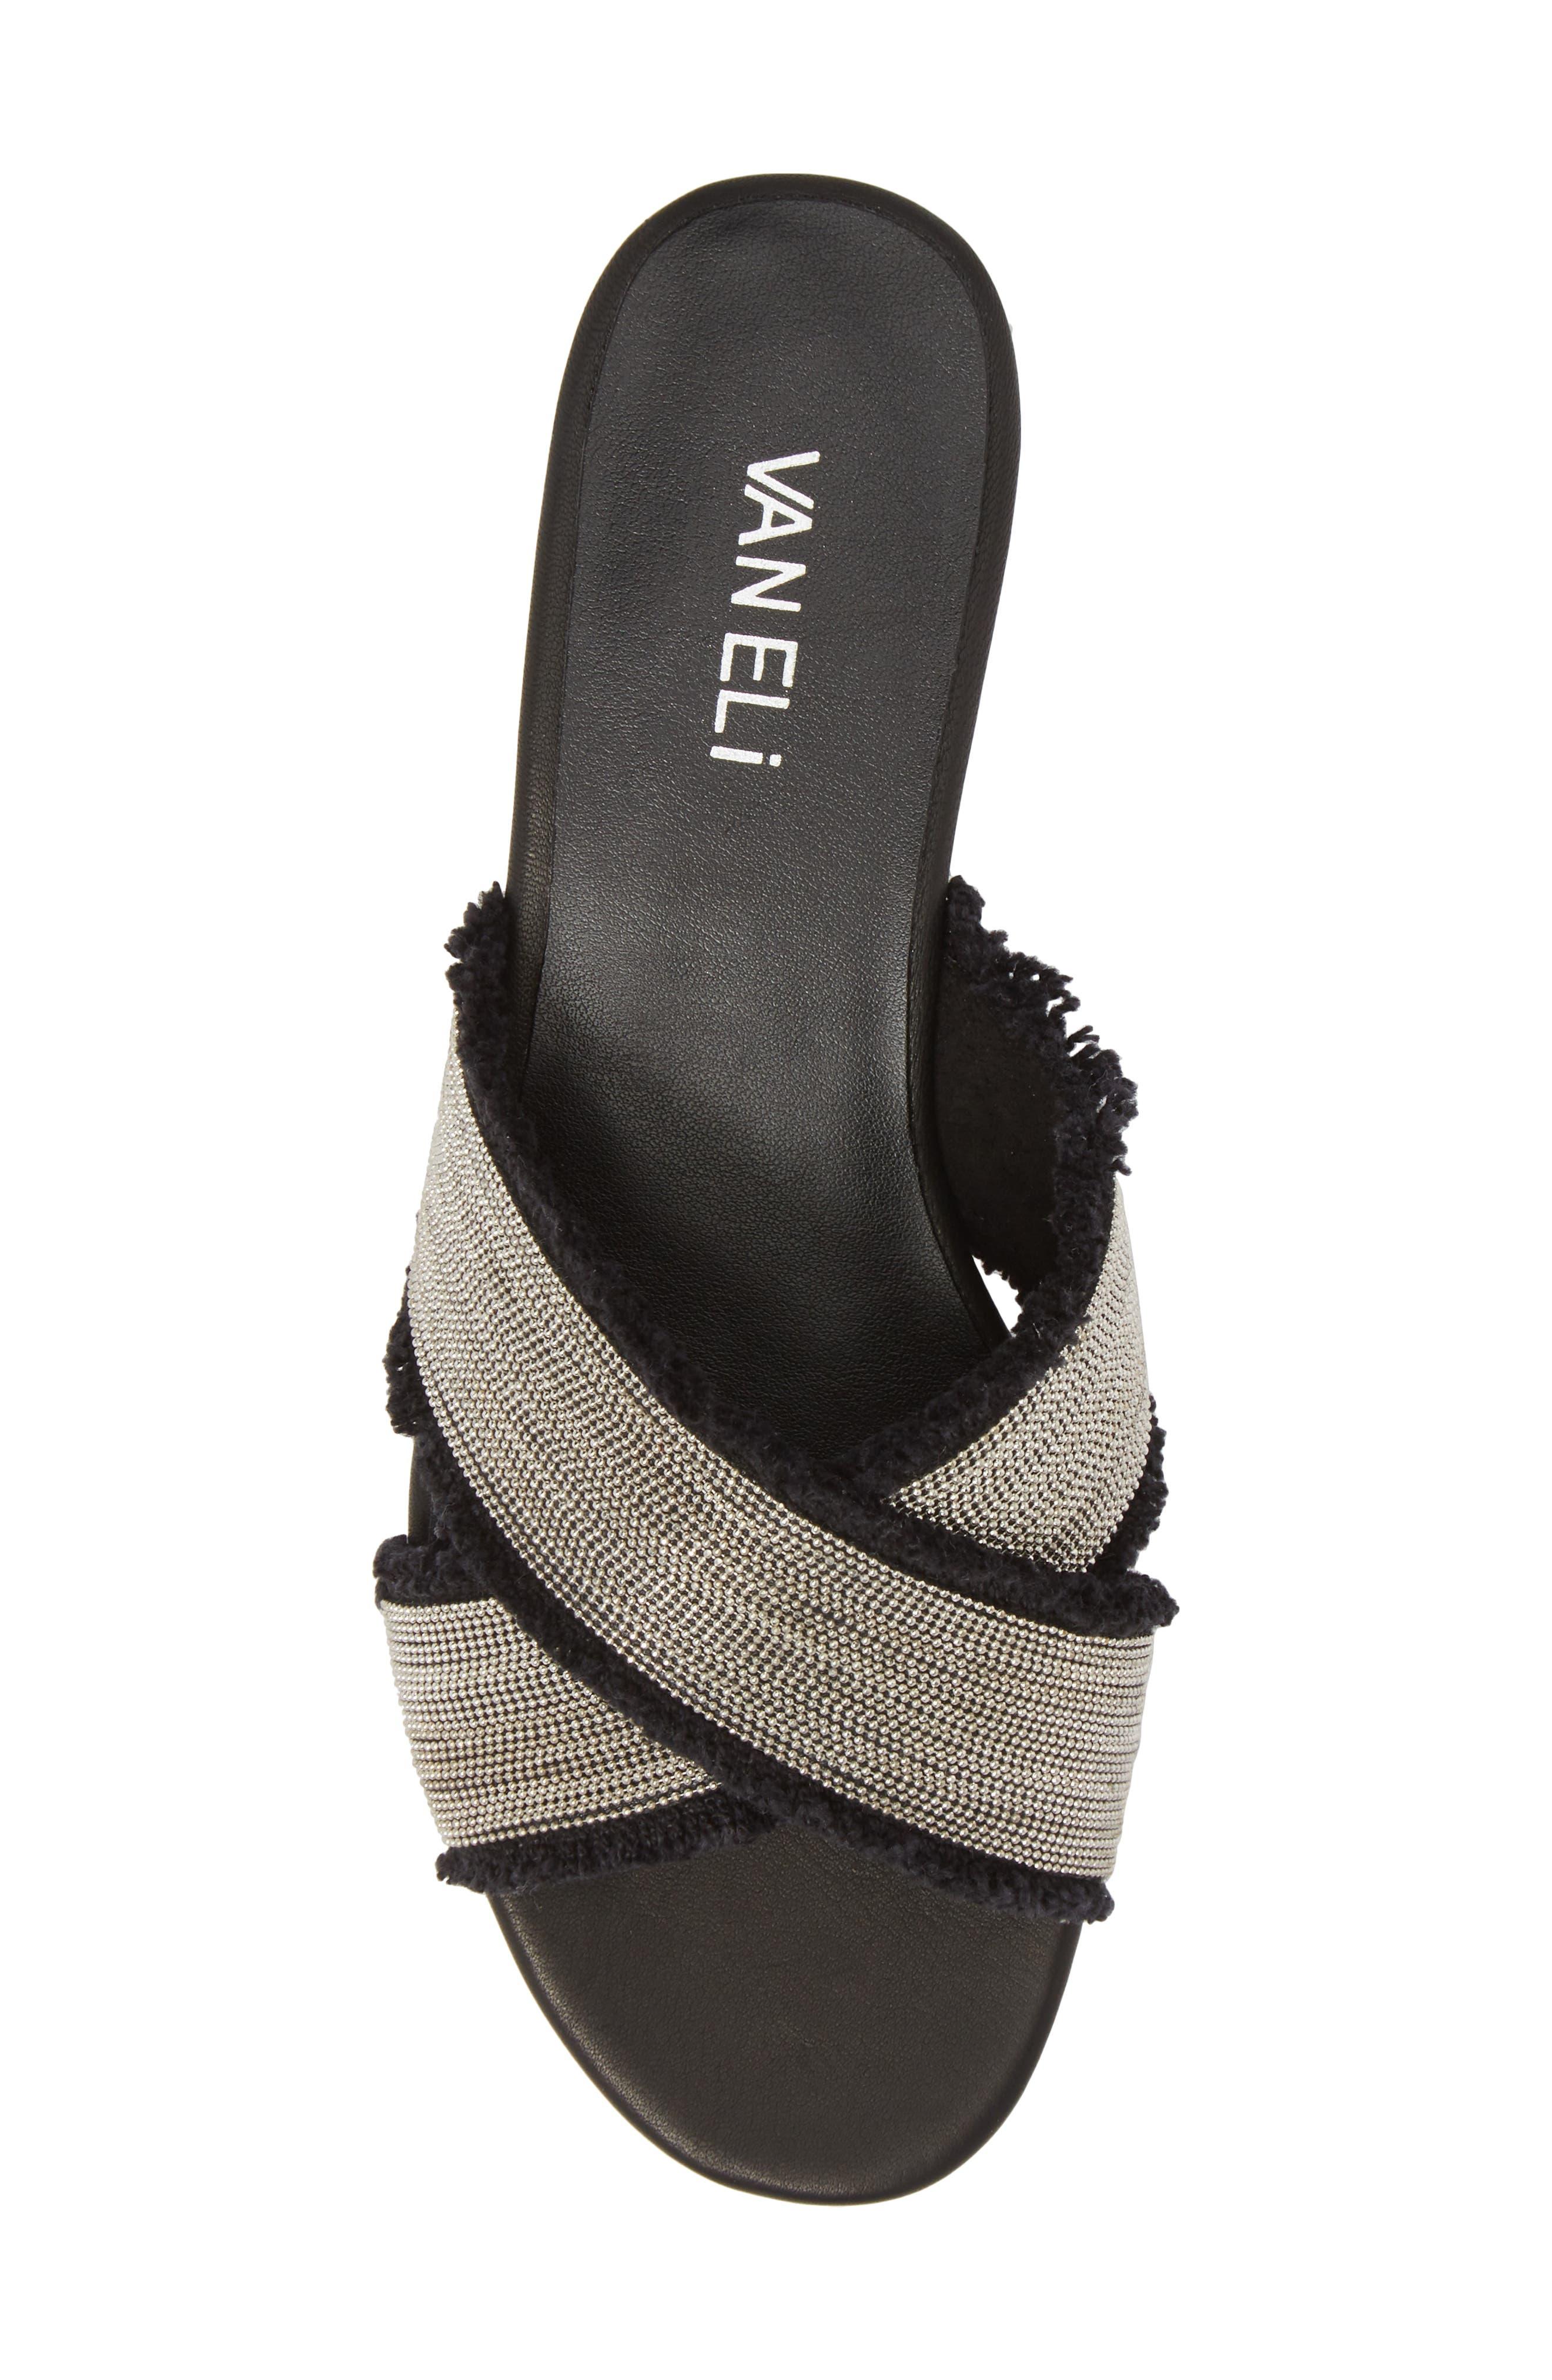 Baret Embellished Cross Strap Slide Sandal,                             Alternate thumbnail 5, color,                             BLACK FABRIC